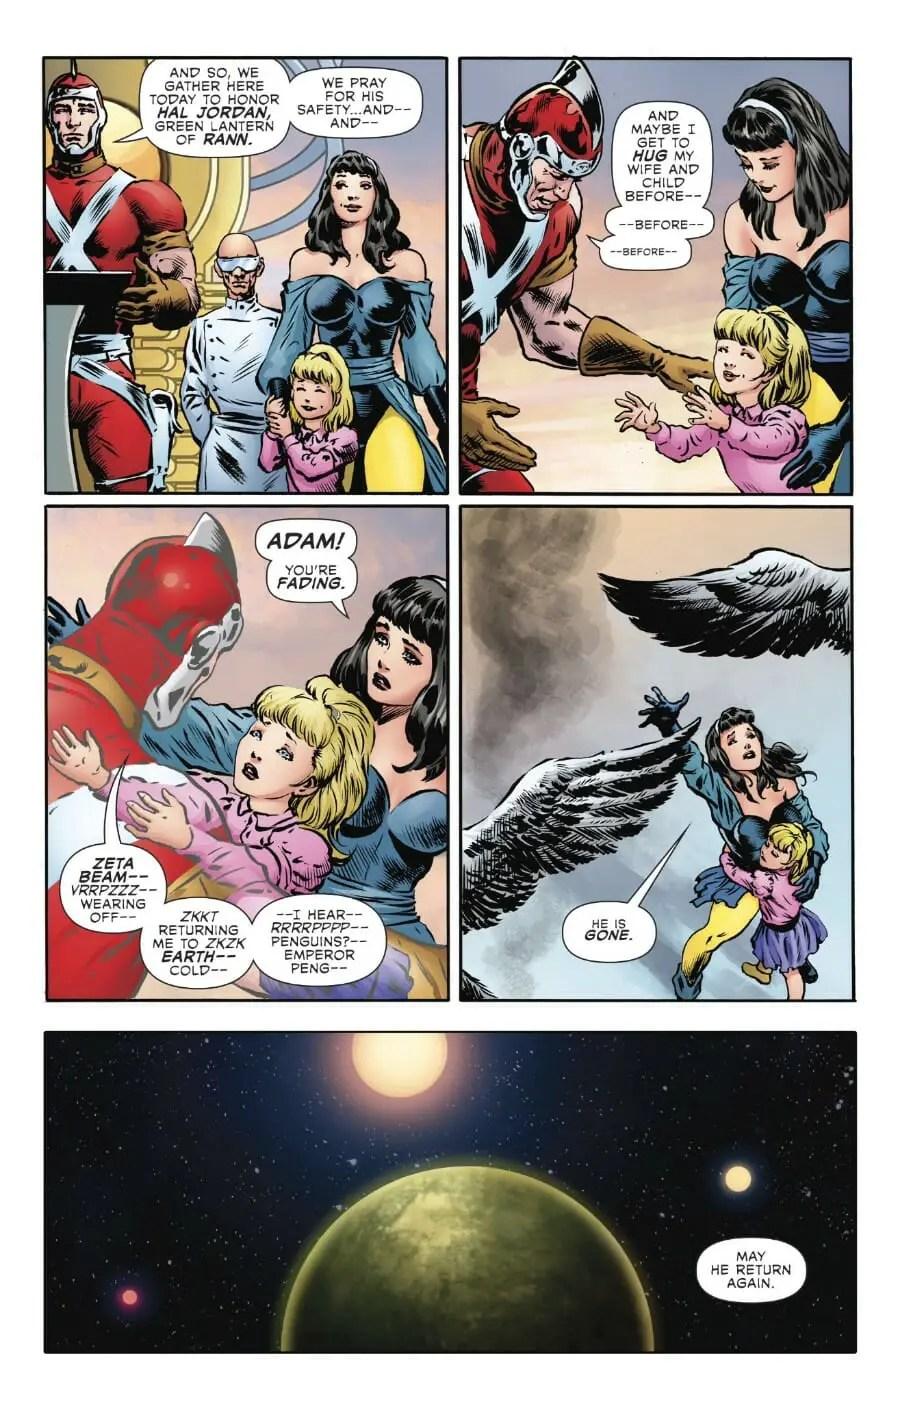 The Green Lantern #6 Review - Comic Book Revolution